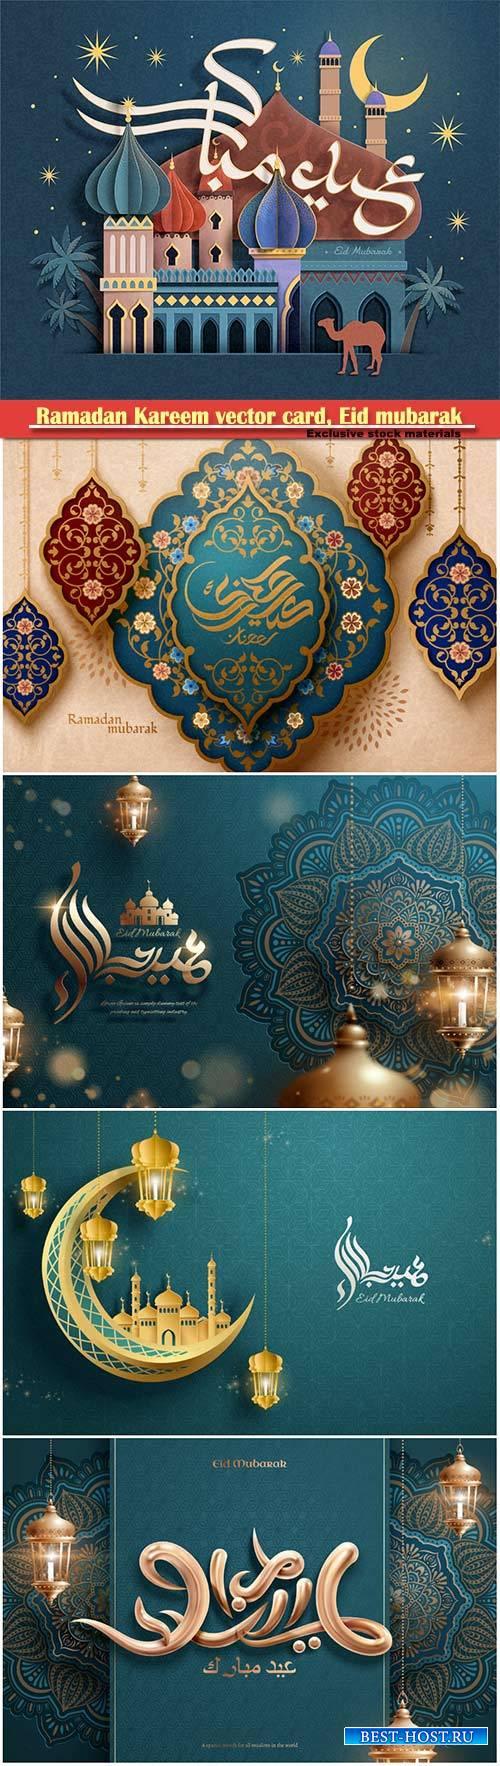 Ramadan Kareem vector card, Eid mubarak calligraphy design templates # 15